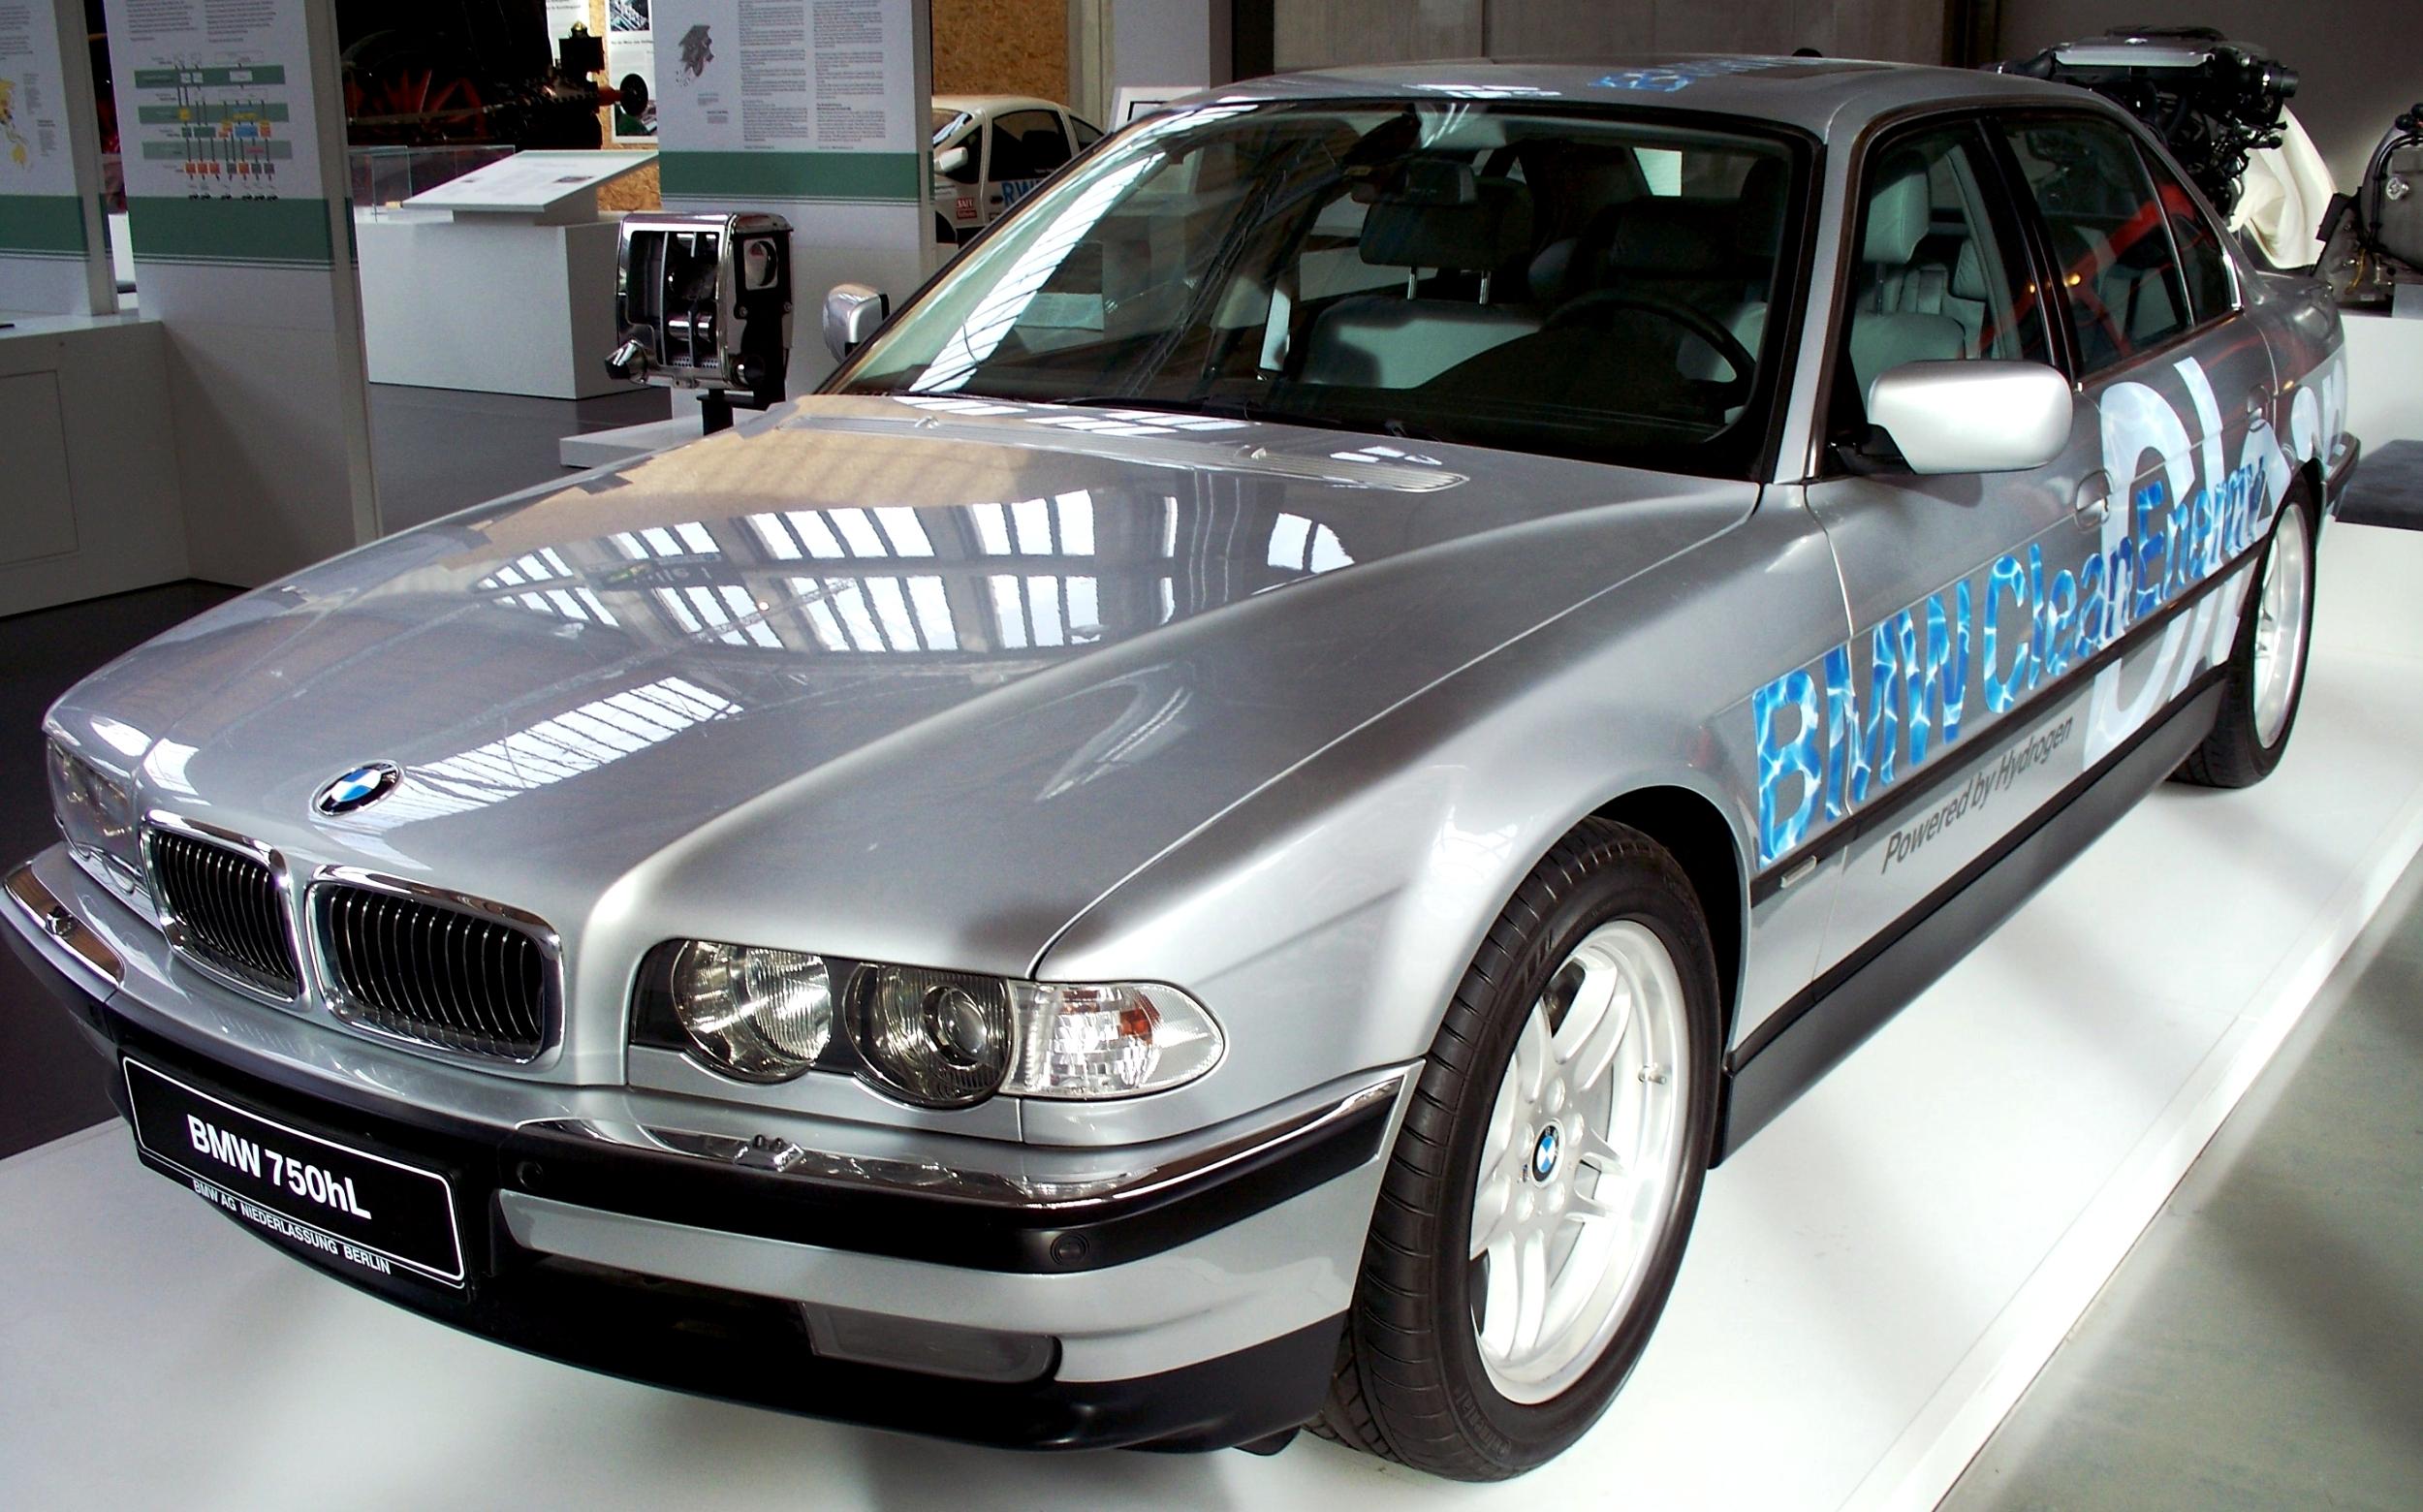 Hydrogen_BMW_750hL.JPG